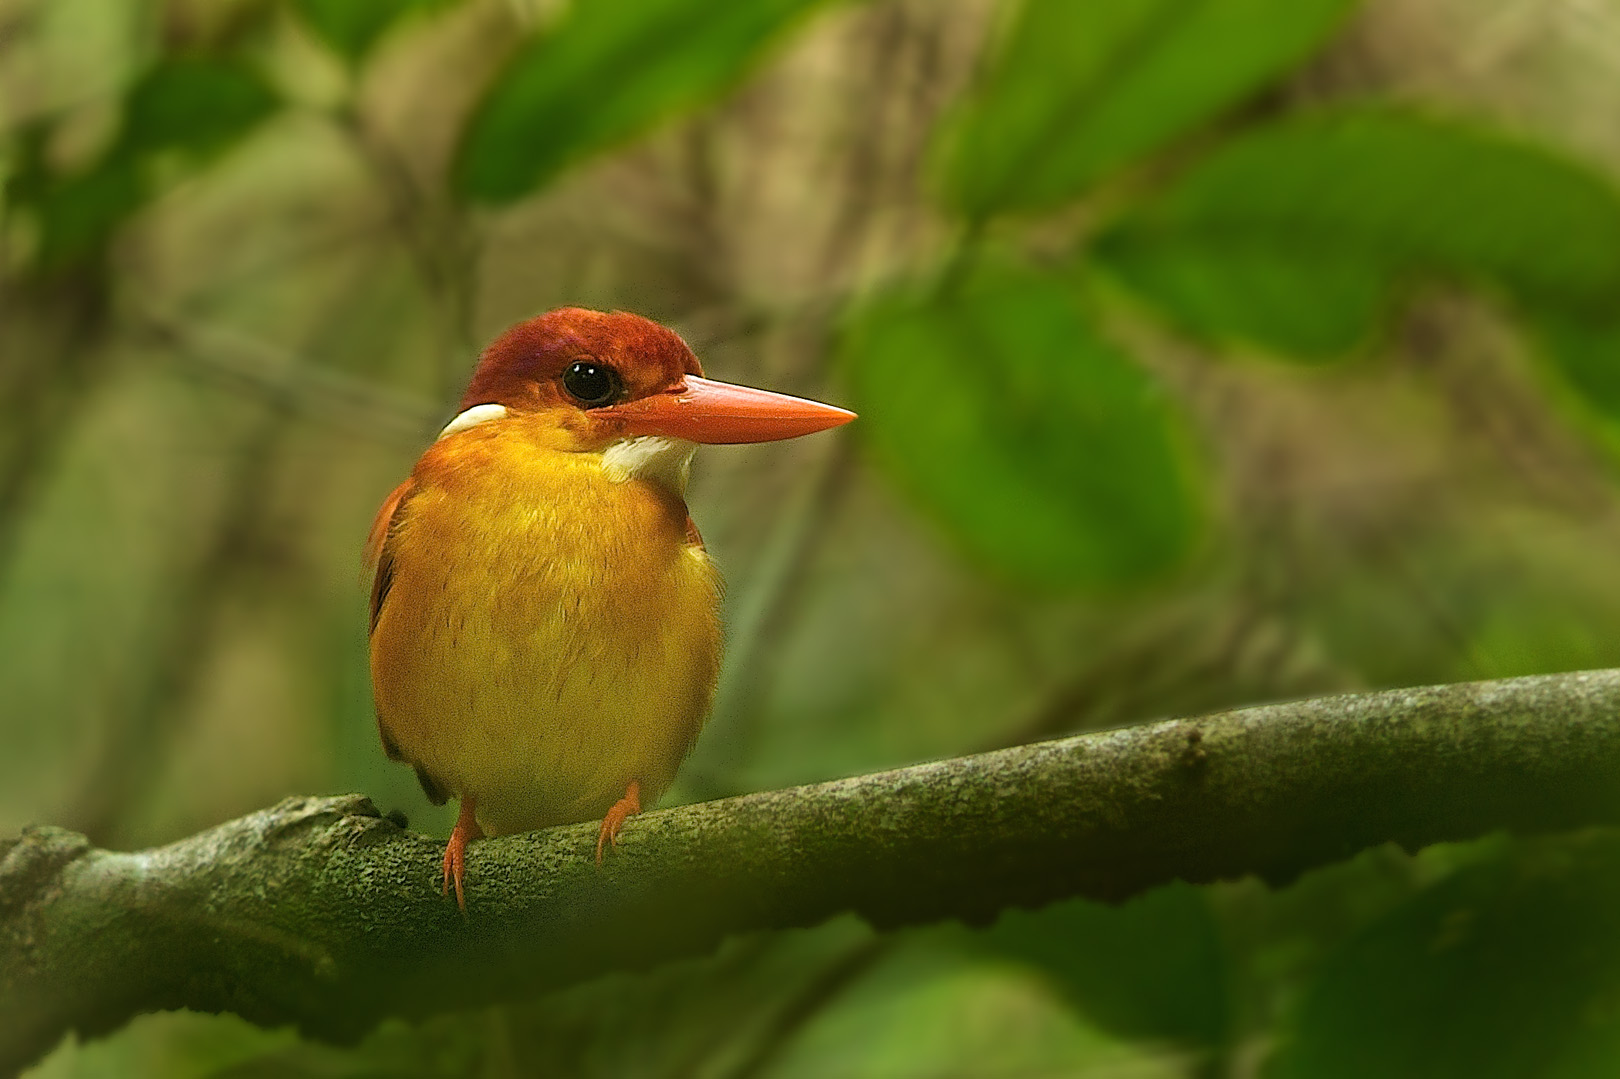 Black-backed Kingfisher – Jungledwergijsvogel – Ceyx erithaca